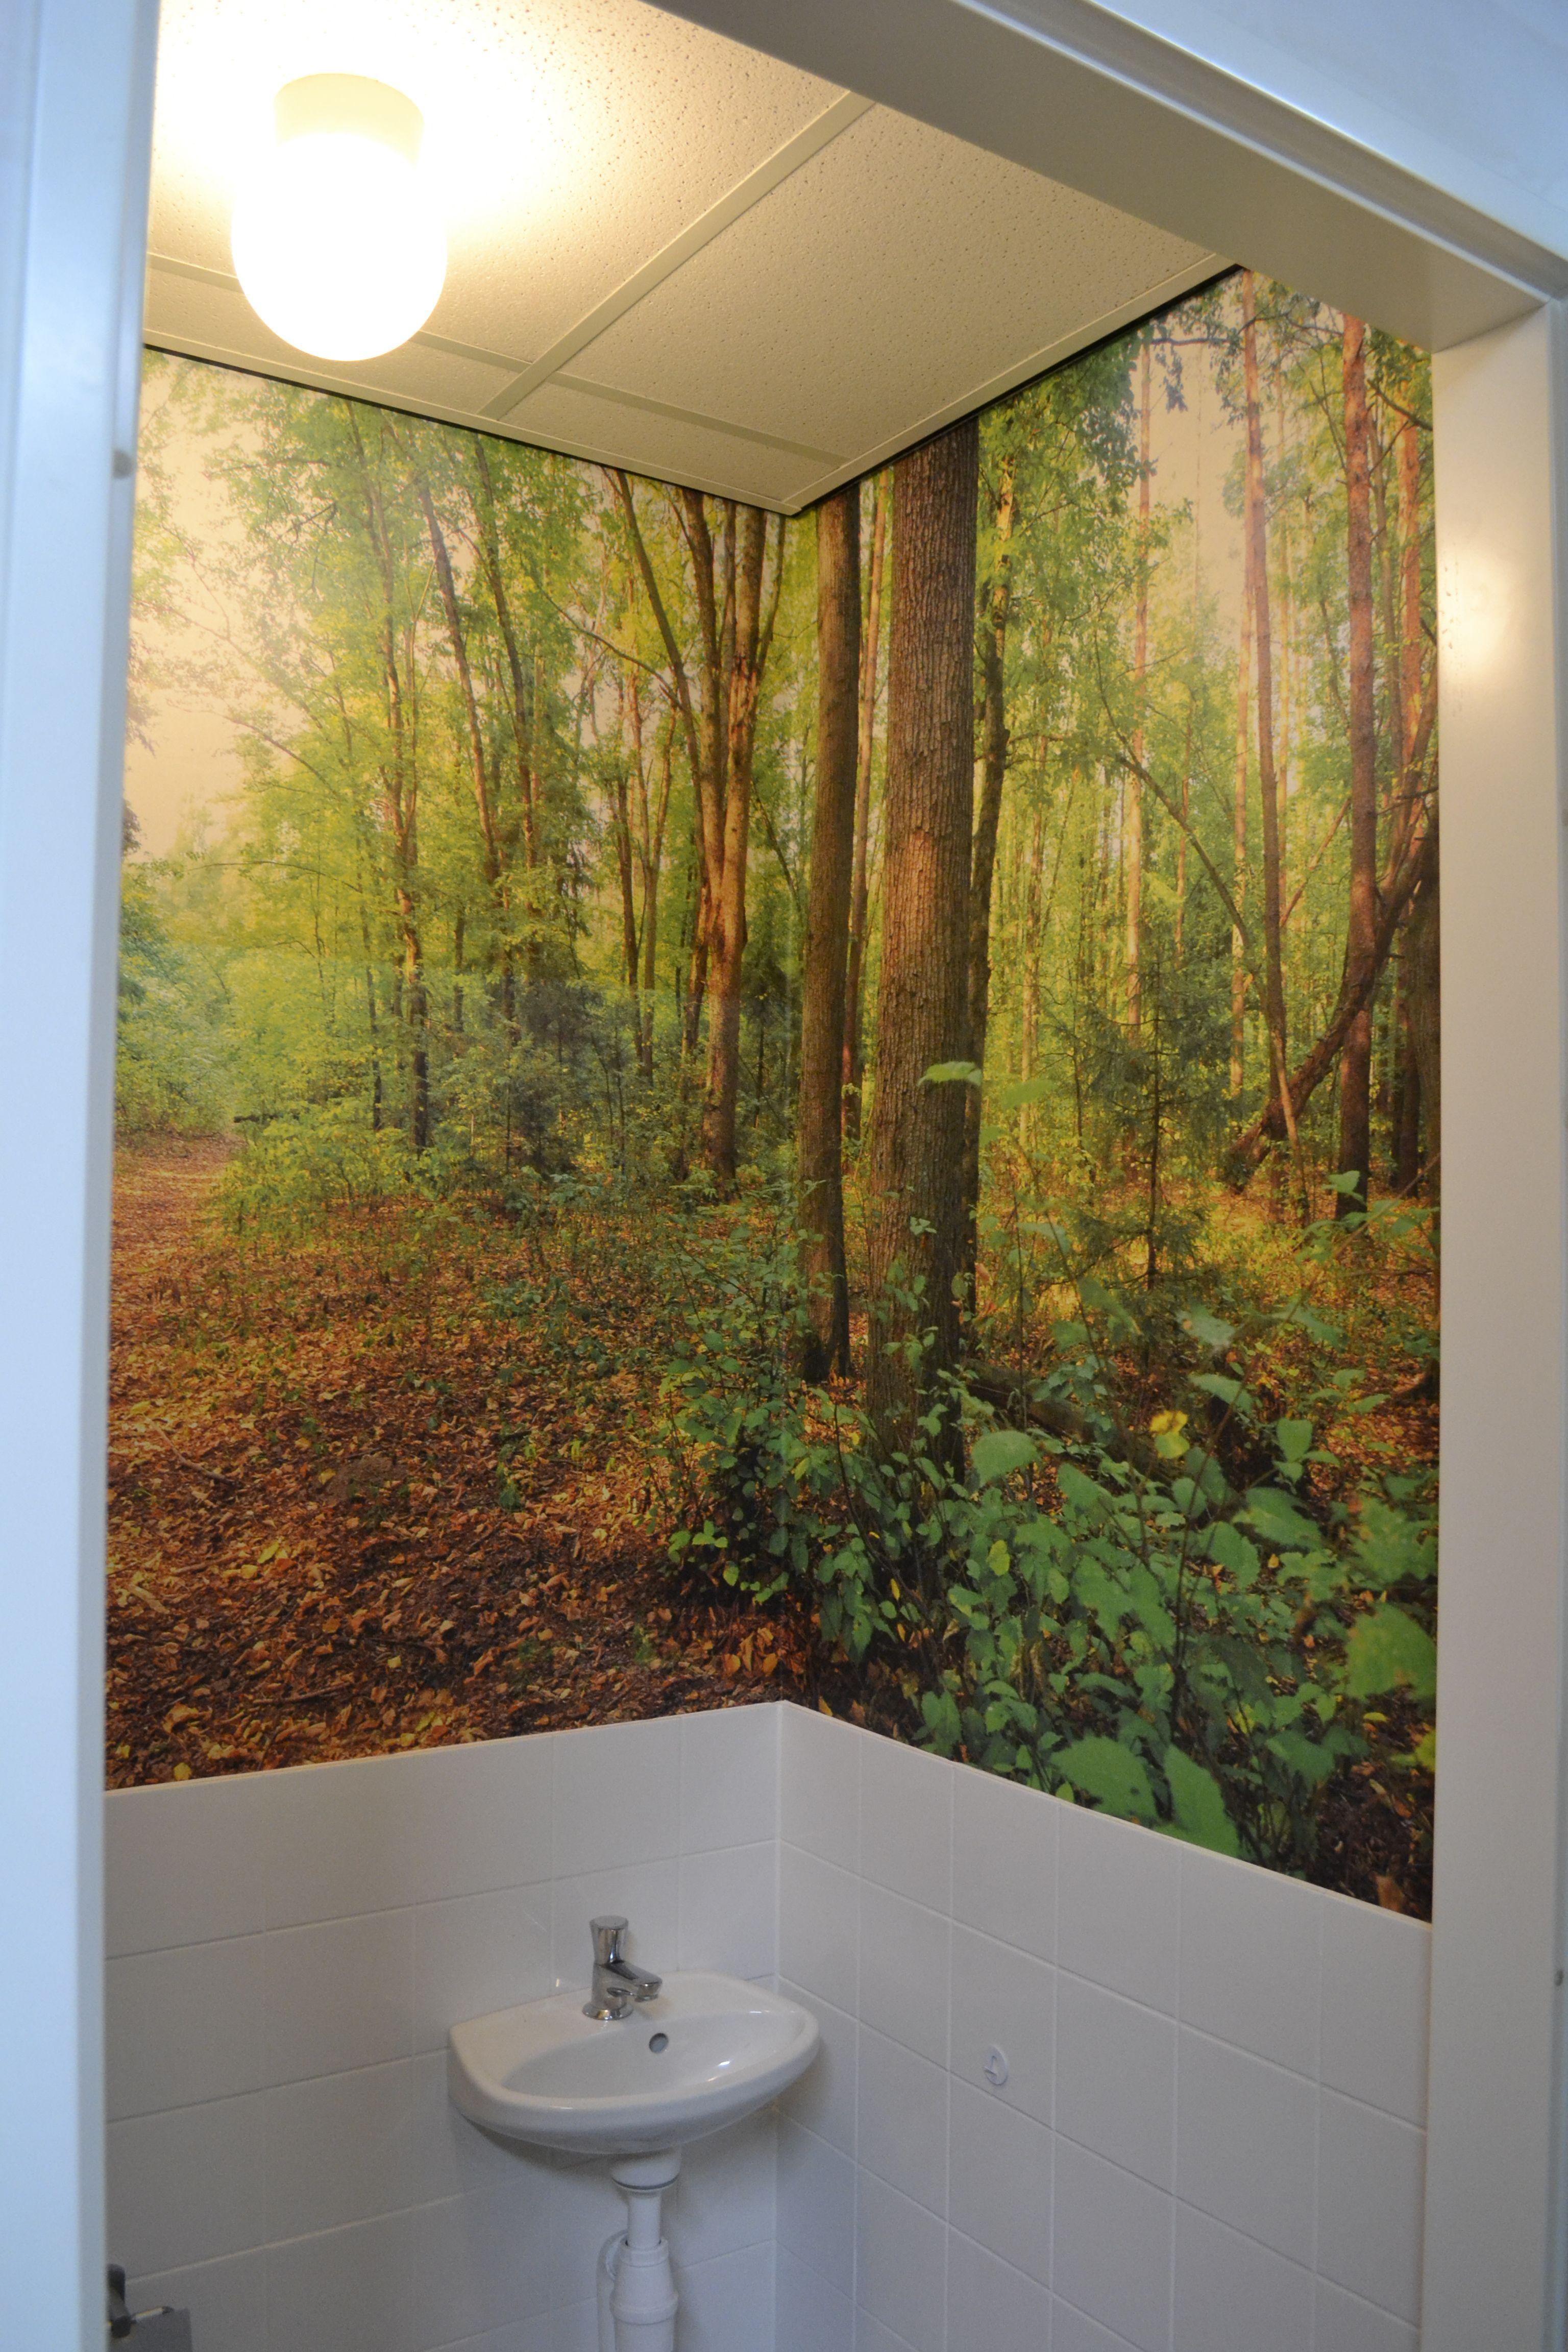 #art2wall #wallpaper #walldesign #wallcovering #nature